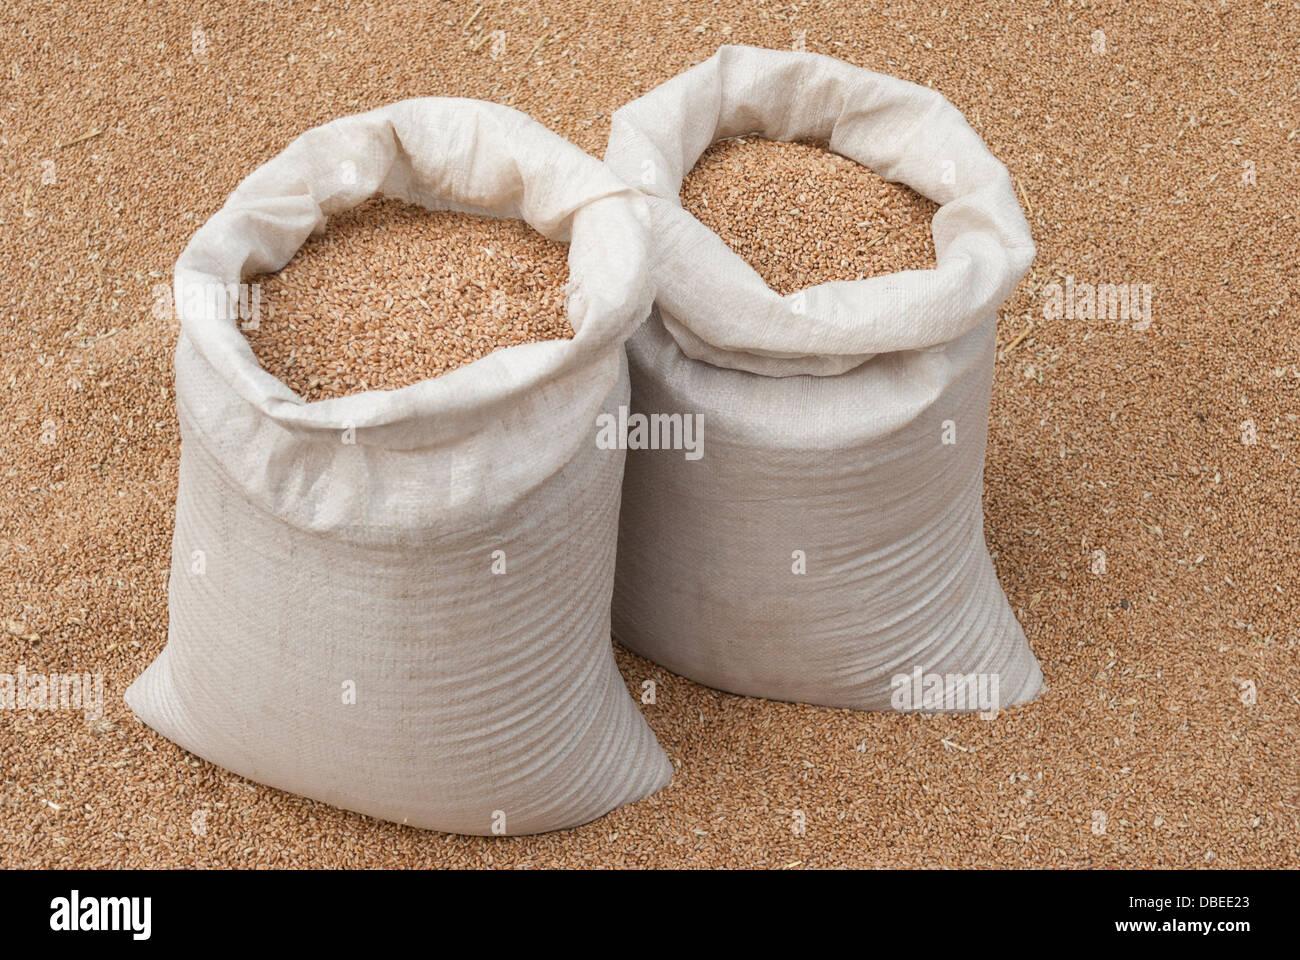 Sacks of wheat. - Stock Image